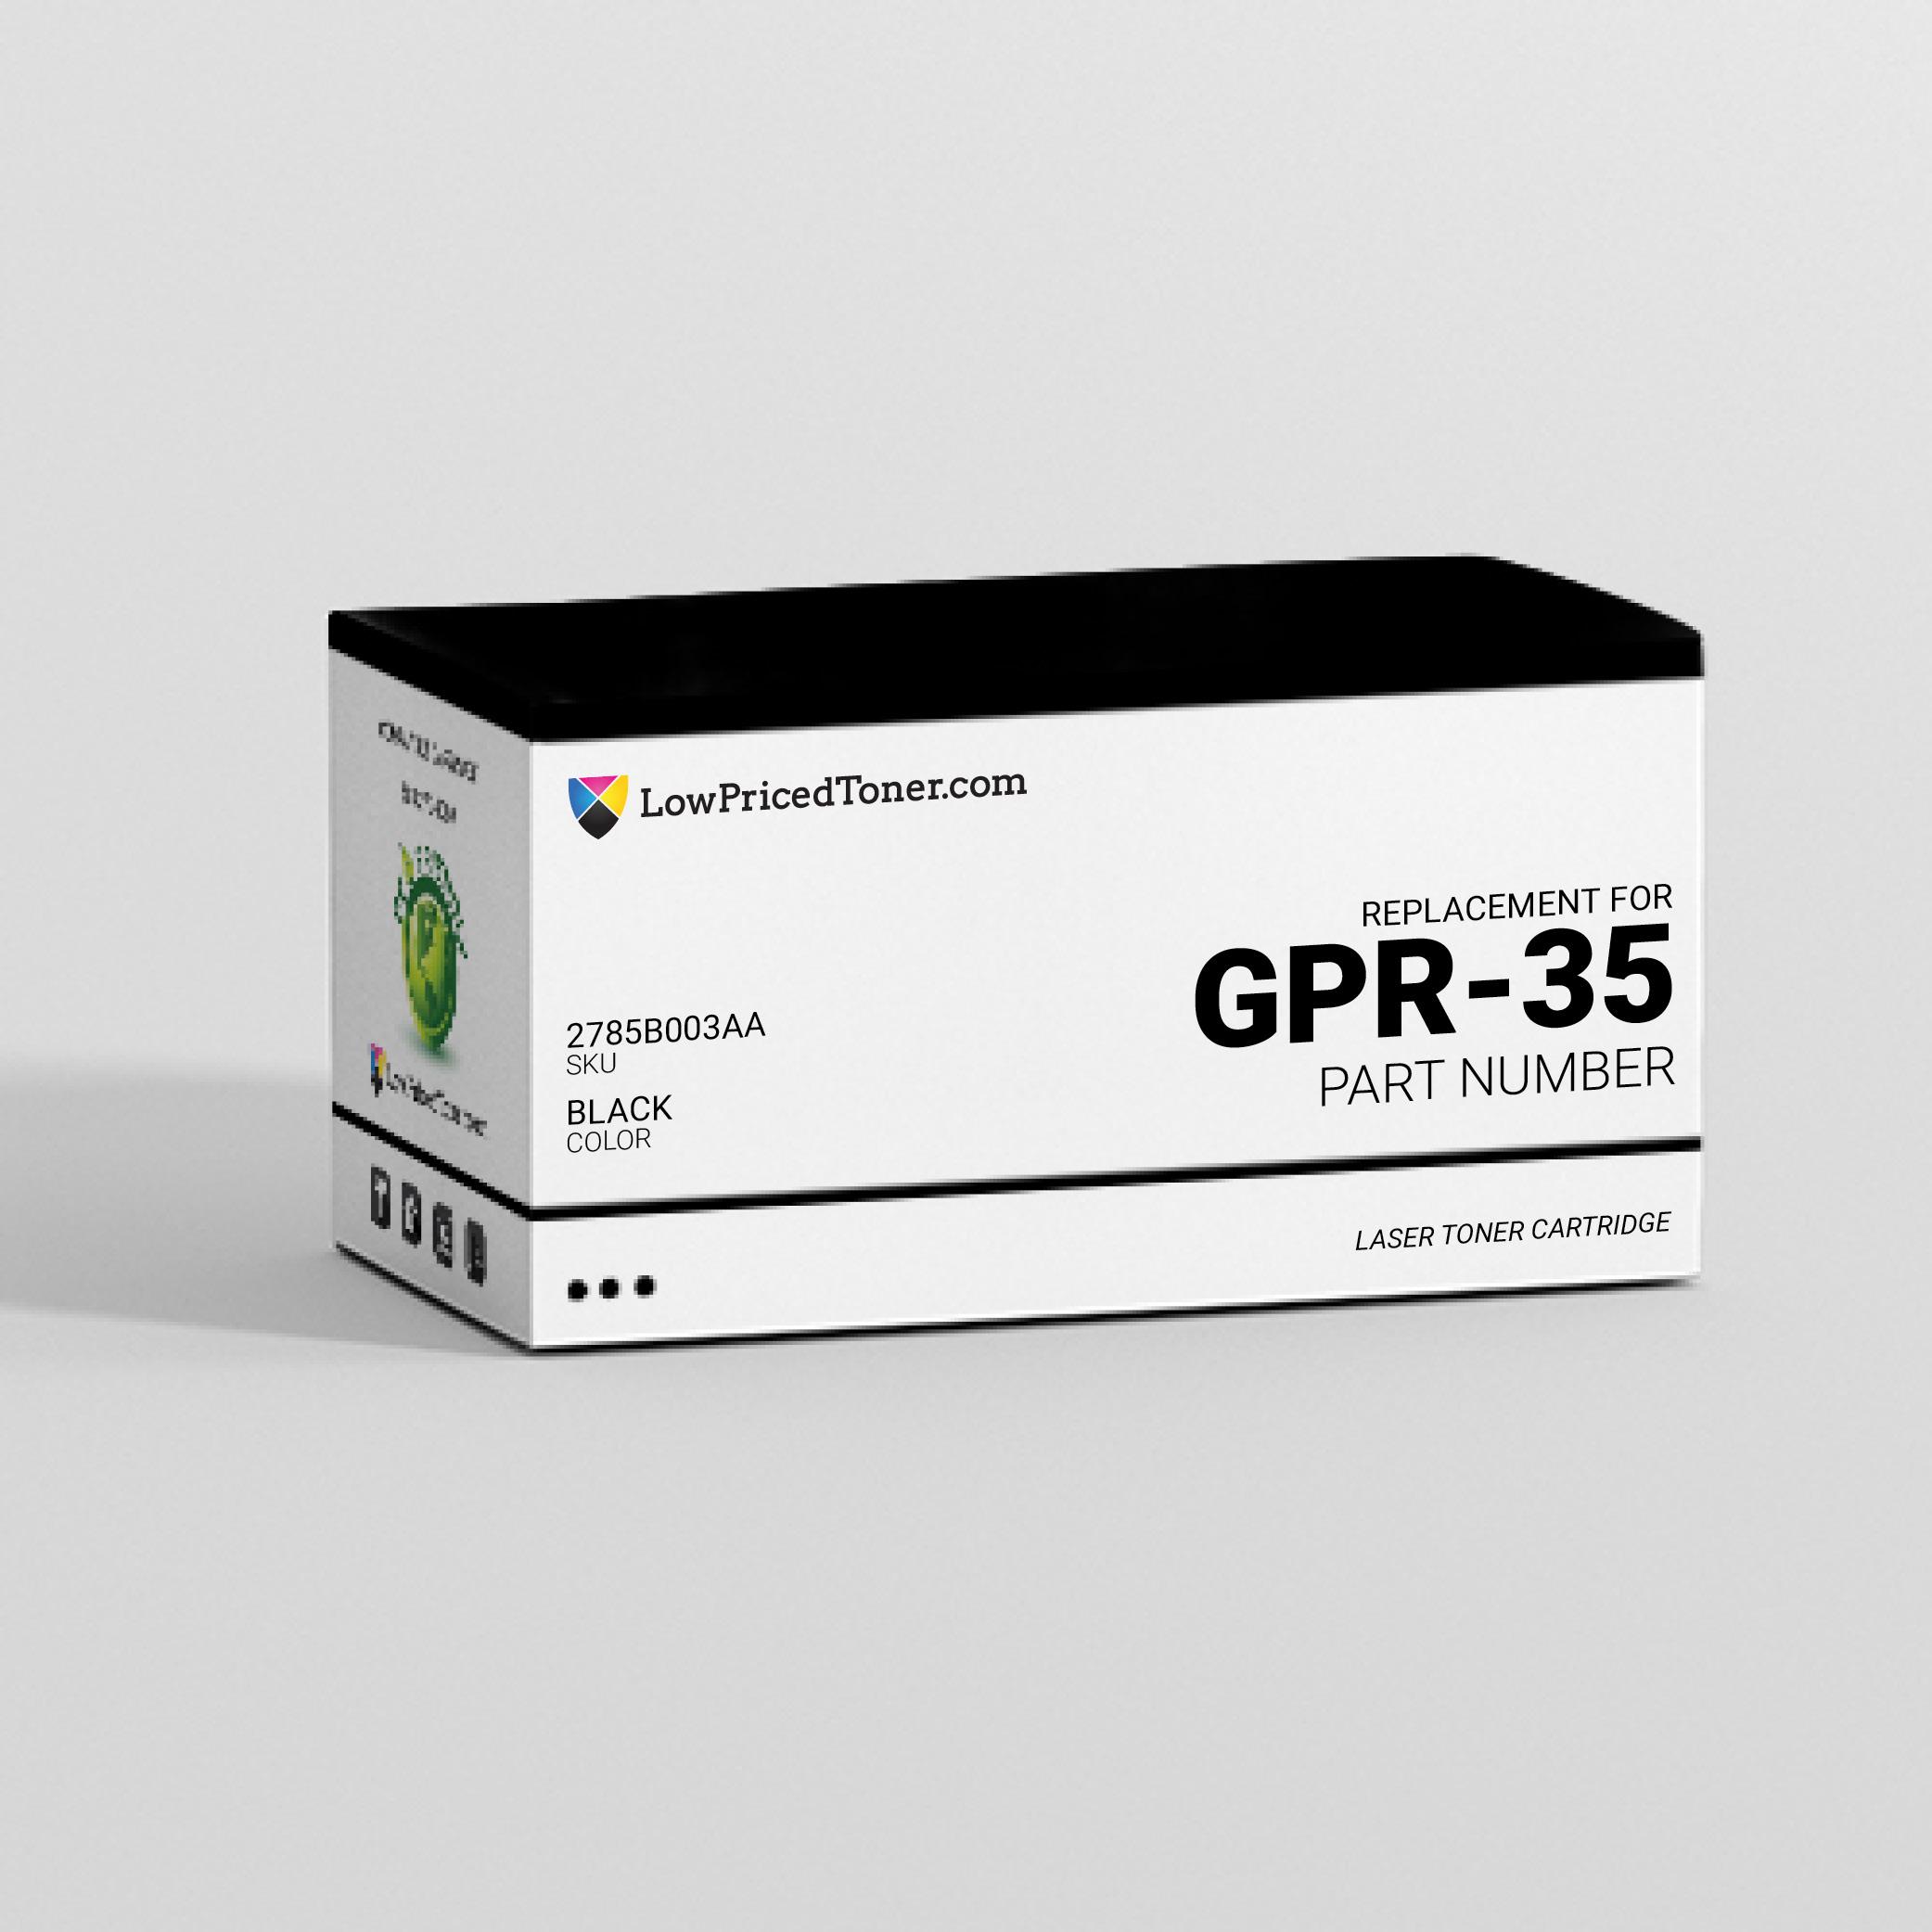 Canon 2785B003AA GPR-35 Compatible Black Laser Toner Cartridge